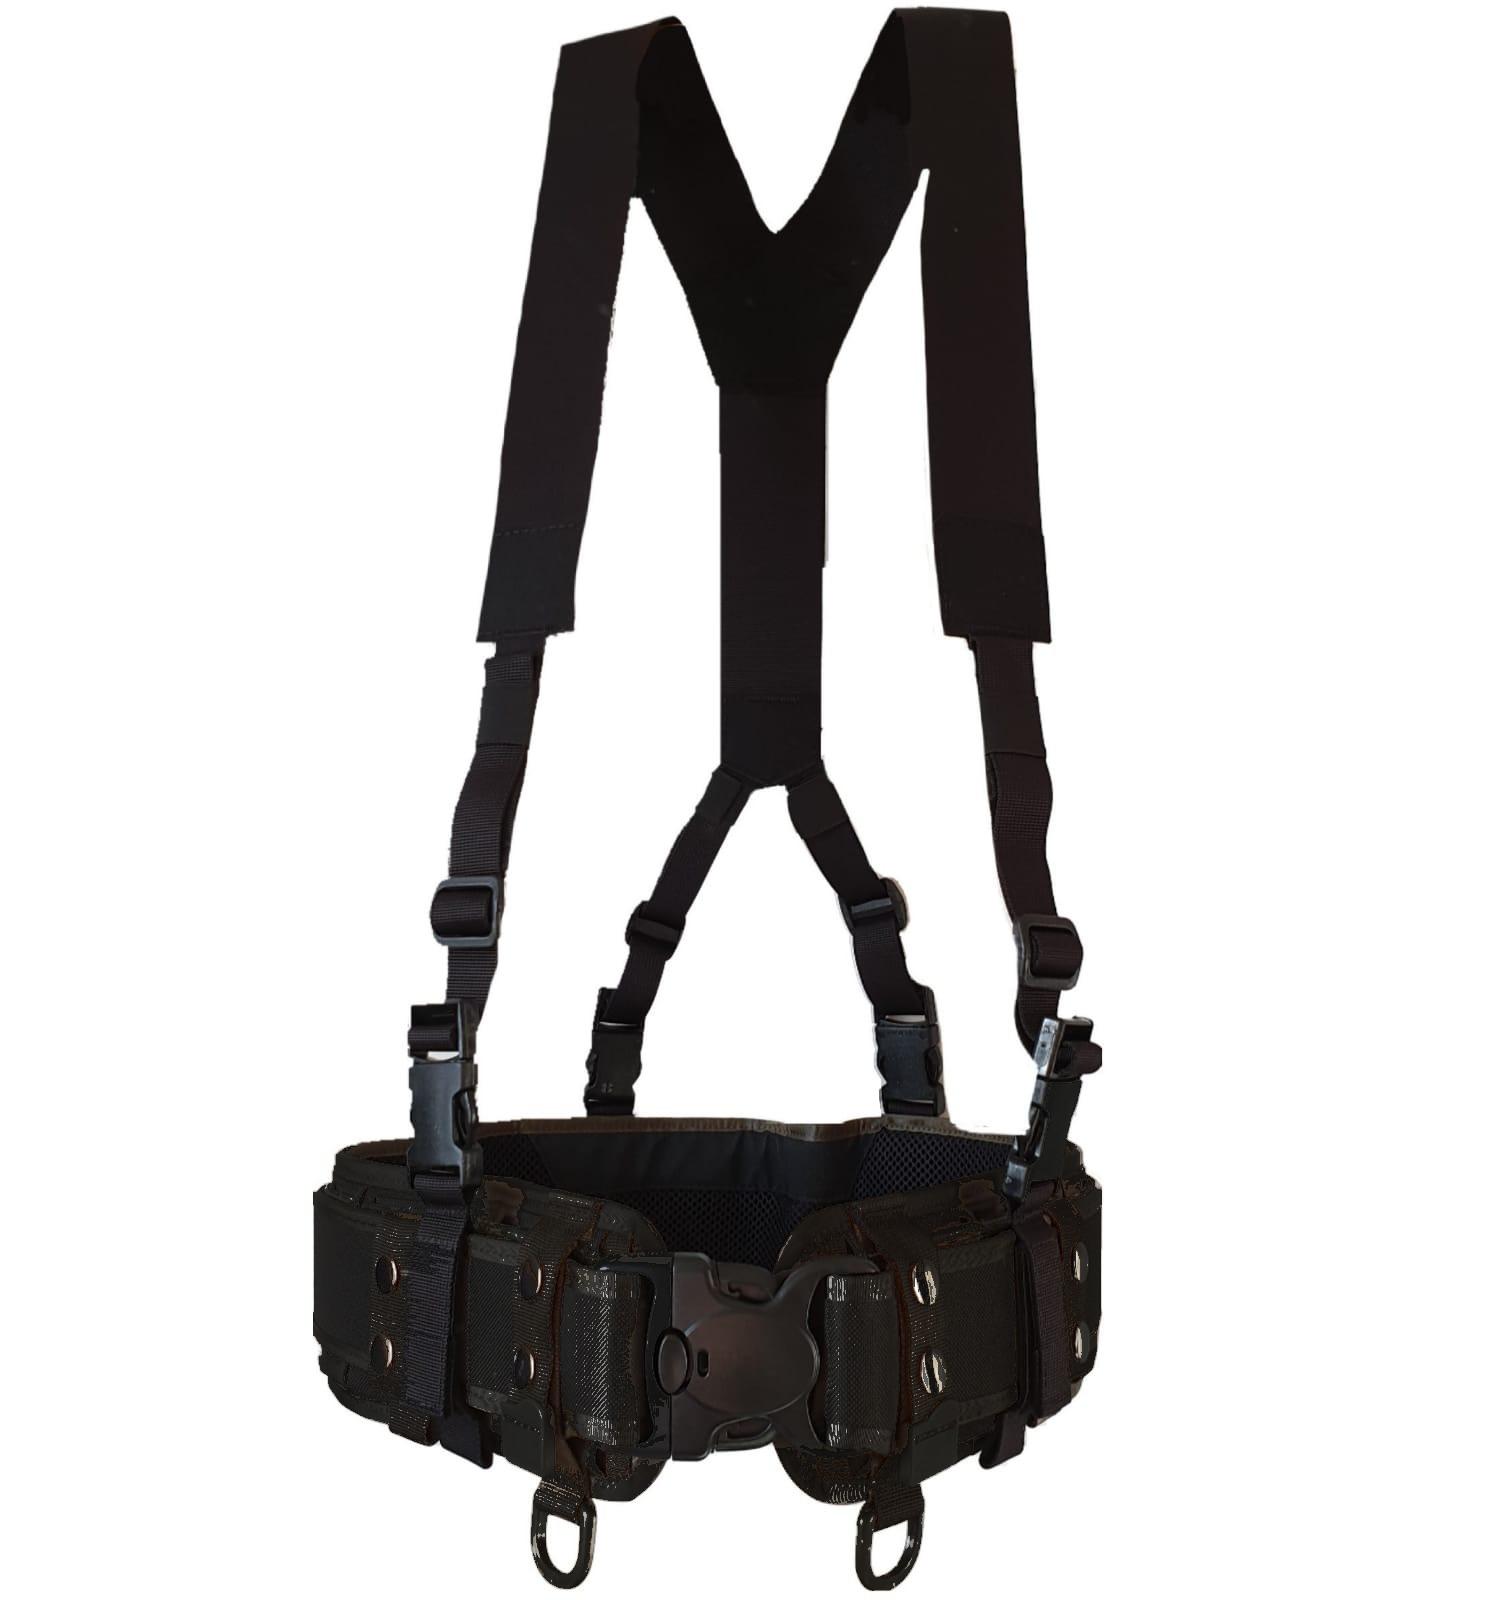 Authorities Suspenders, BLACK